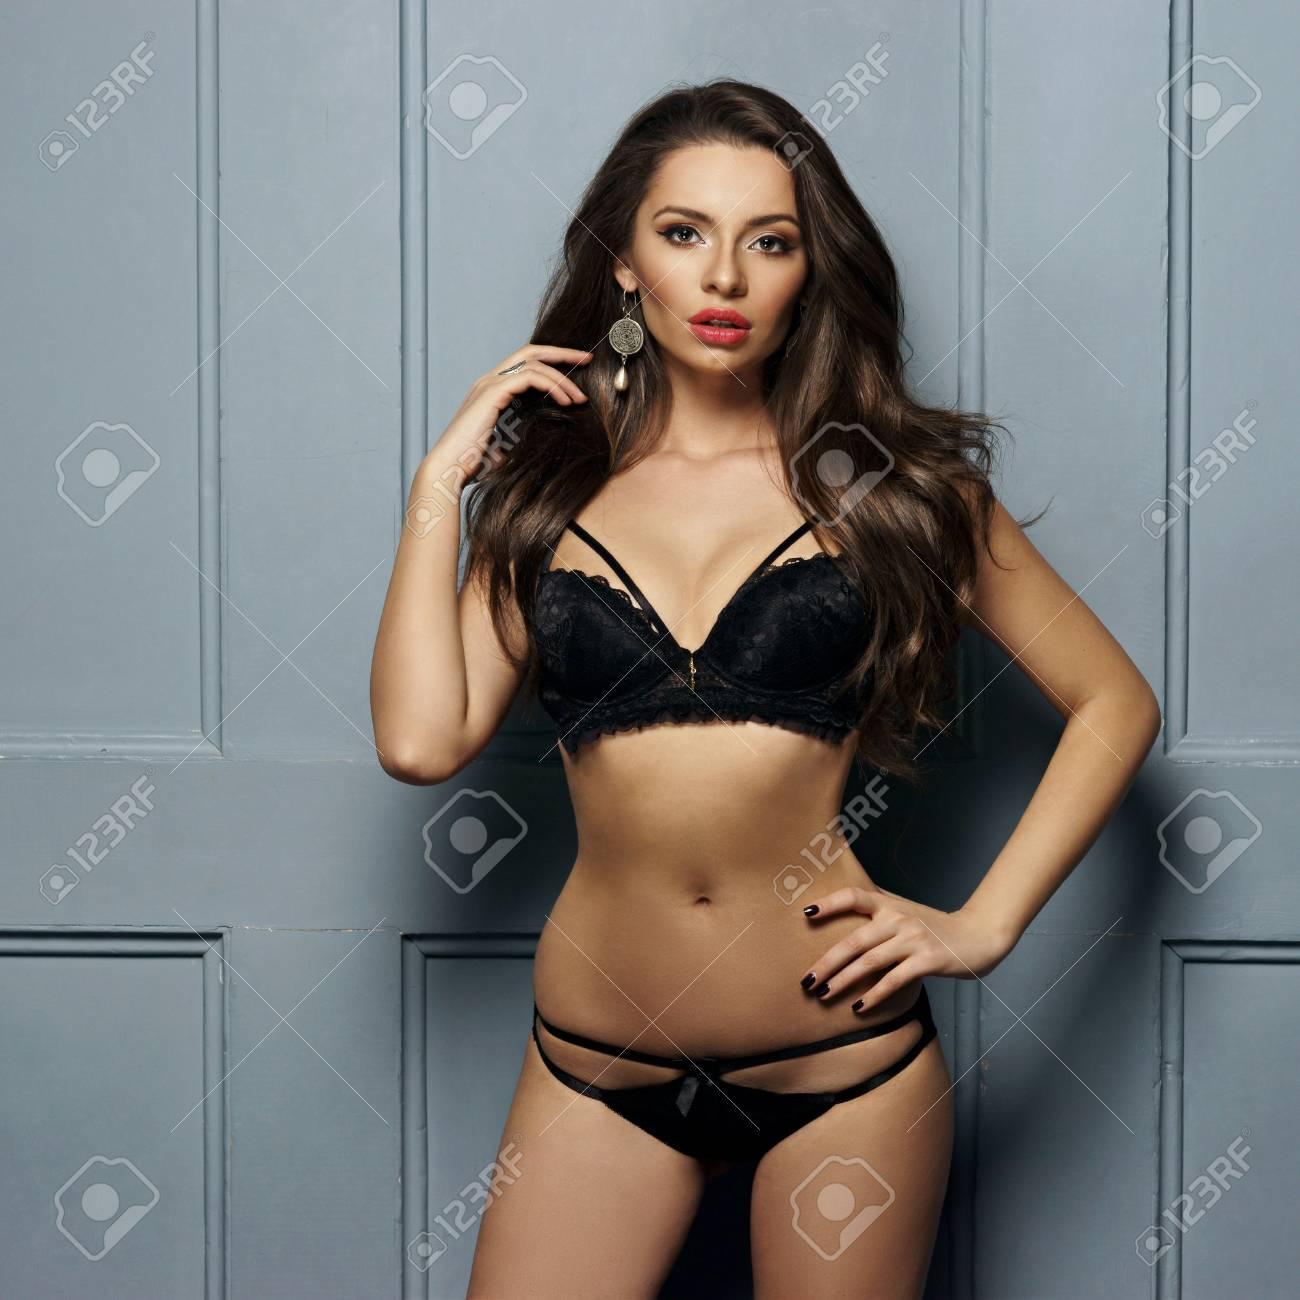 f3d34fb19d7 Half Body Portrait Of Attractive Female Model With Slim Figure ...